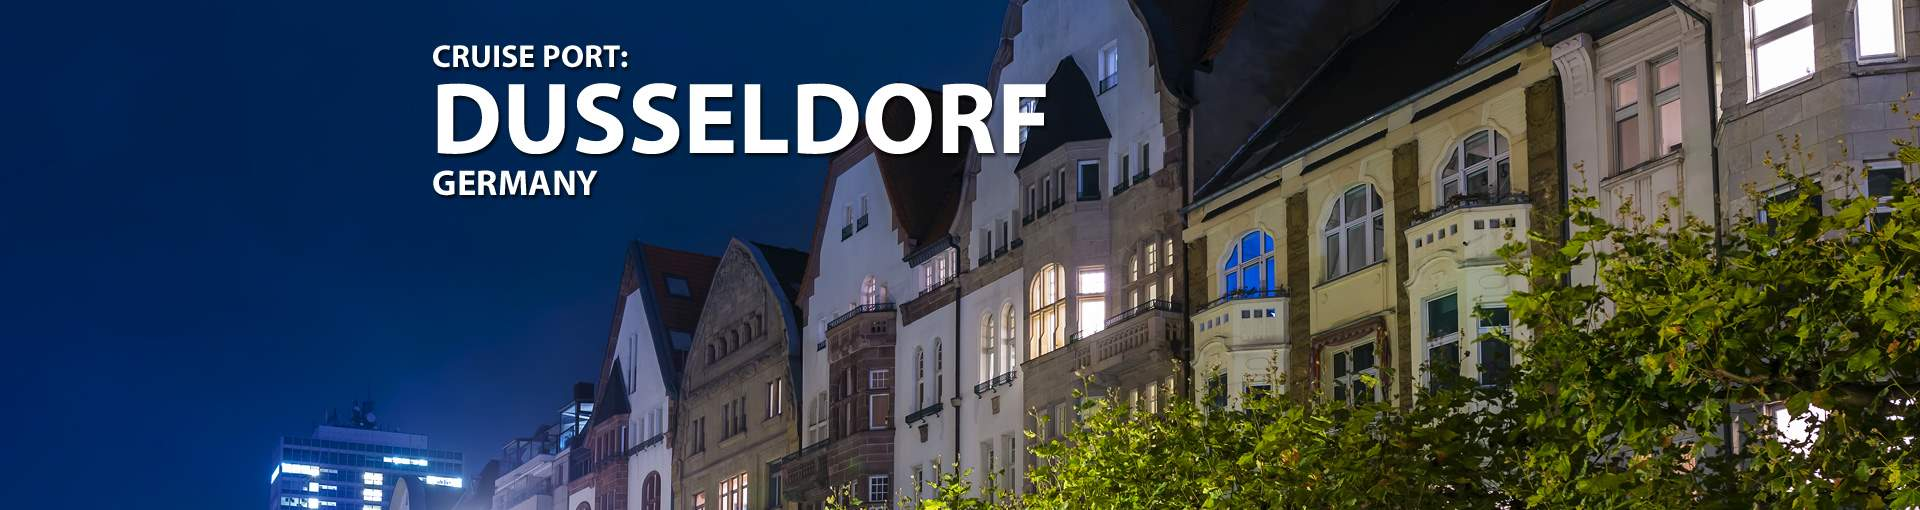 Cruises to Dusseldorf, Germany